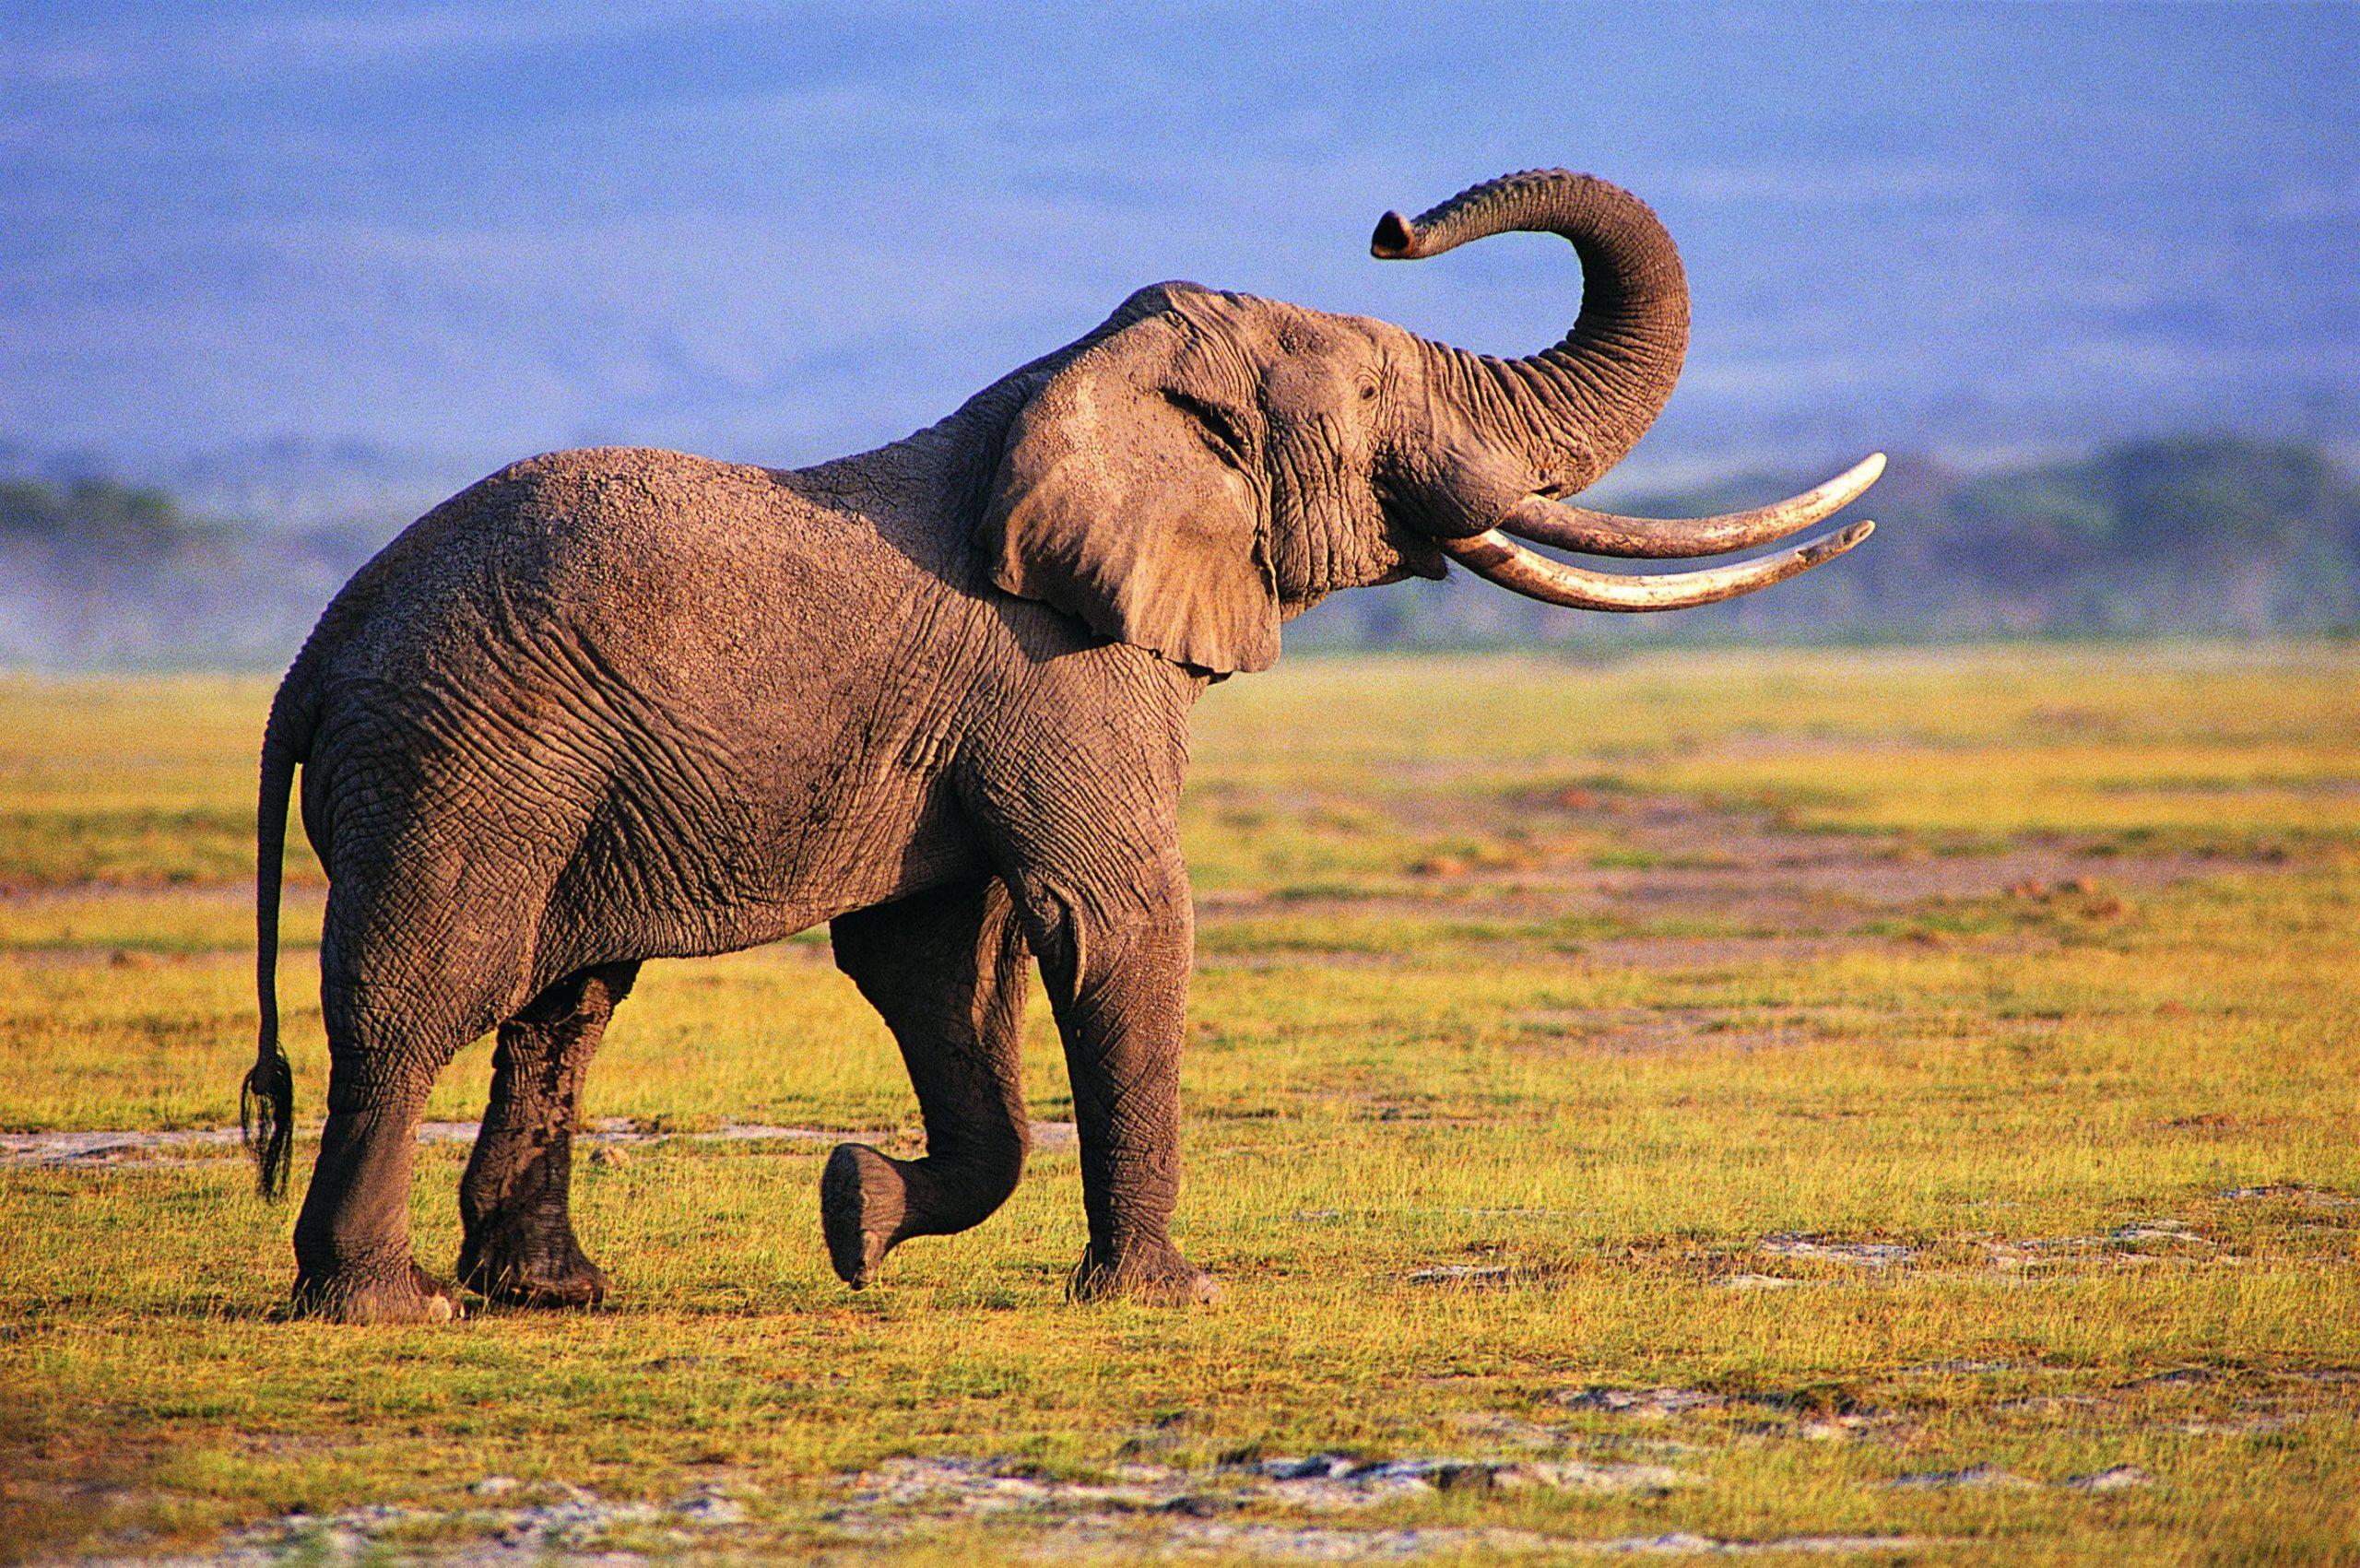 iphone wallpaper elephant